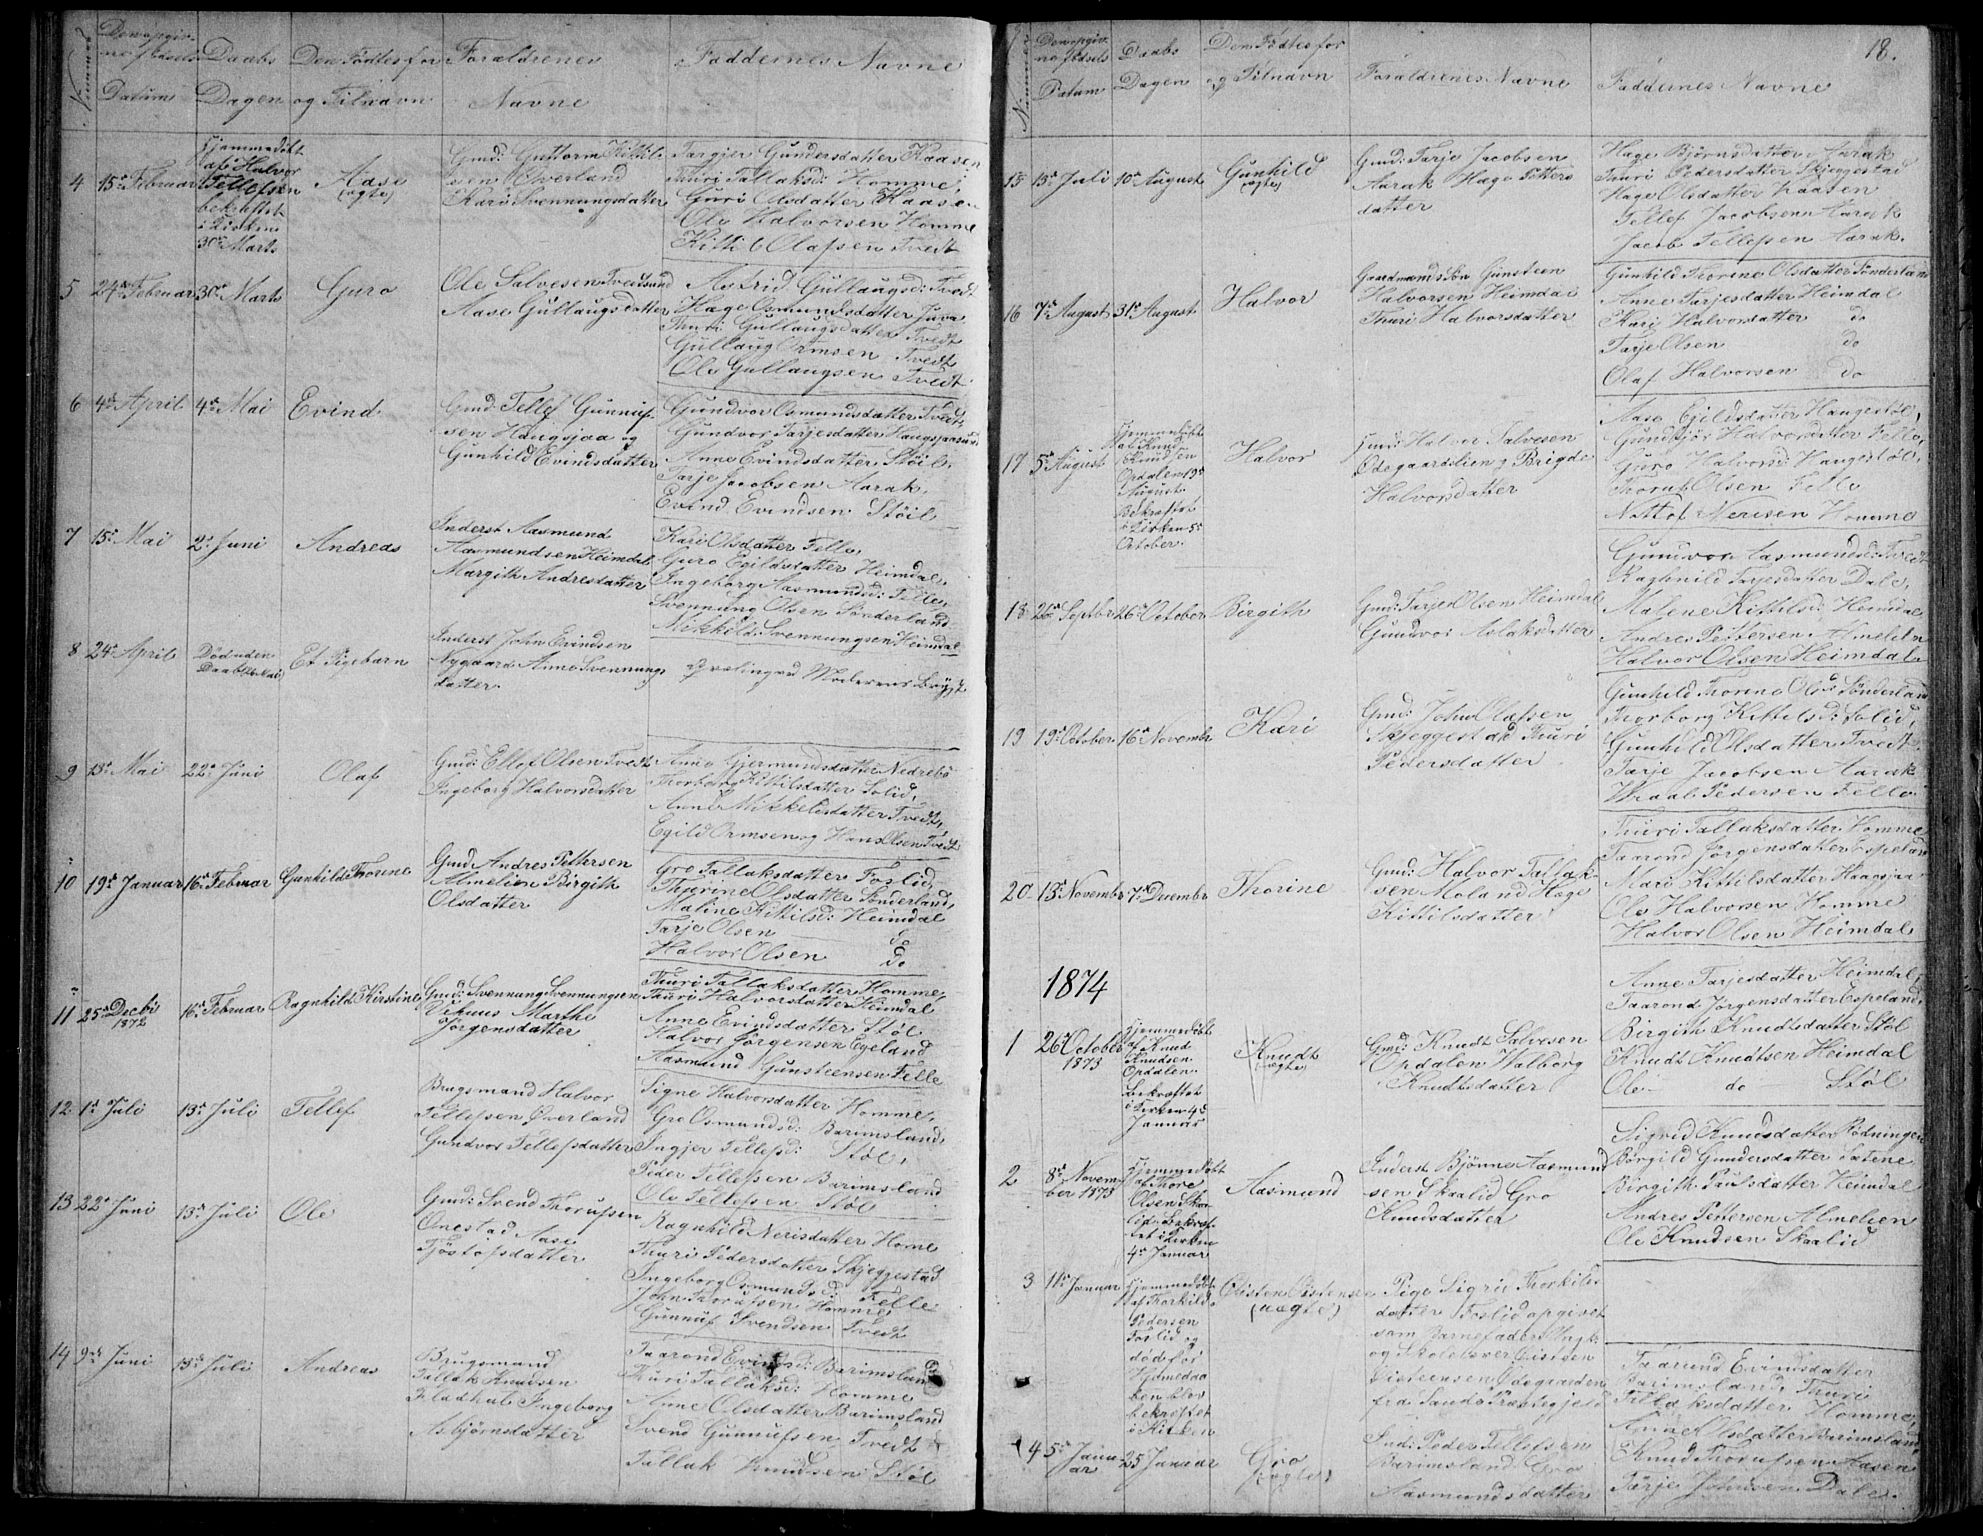 SAKO, Nissedal kirkebøker, G/Gb/L0002: Klokkerbok nr. II 2, 1863-1892, s. 18